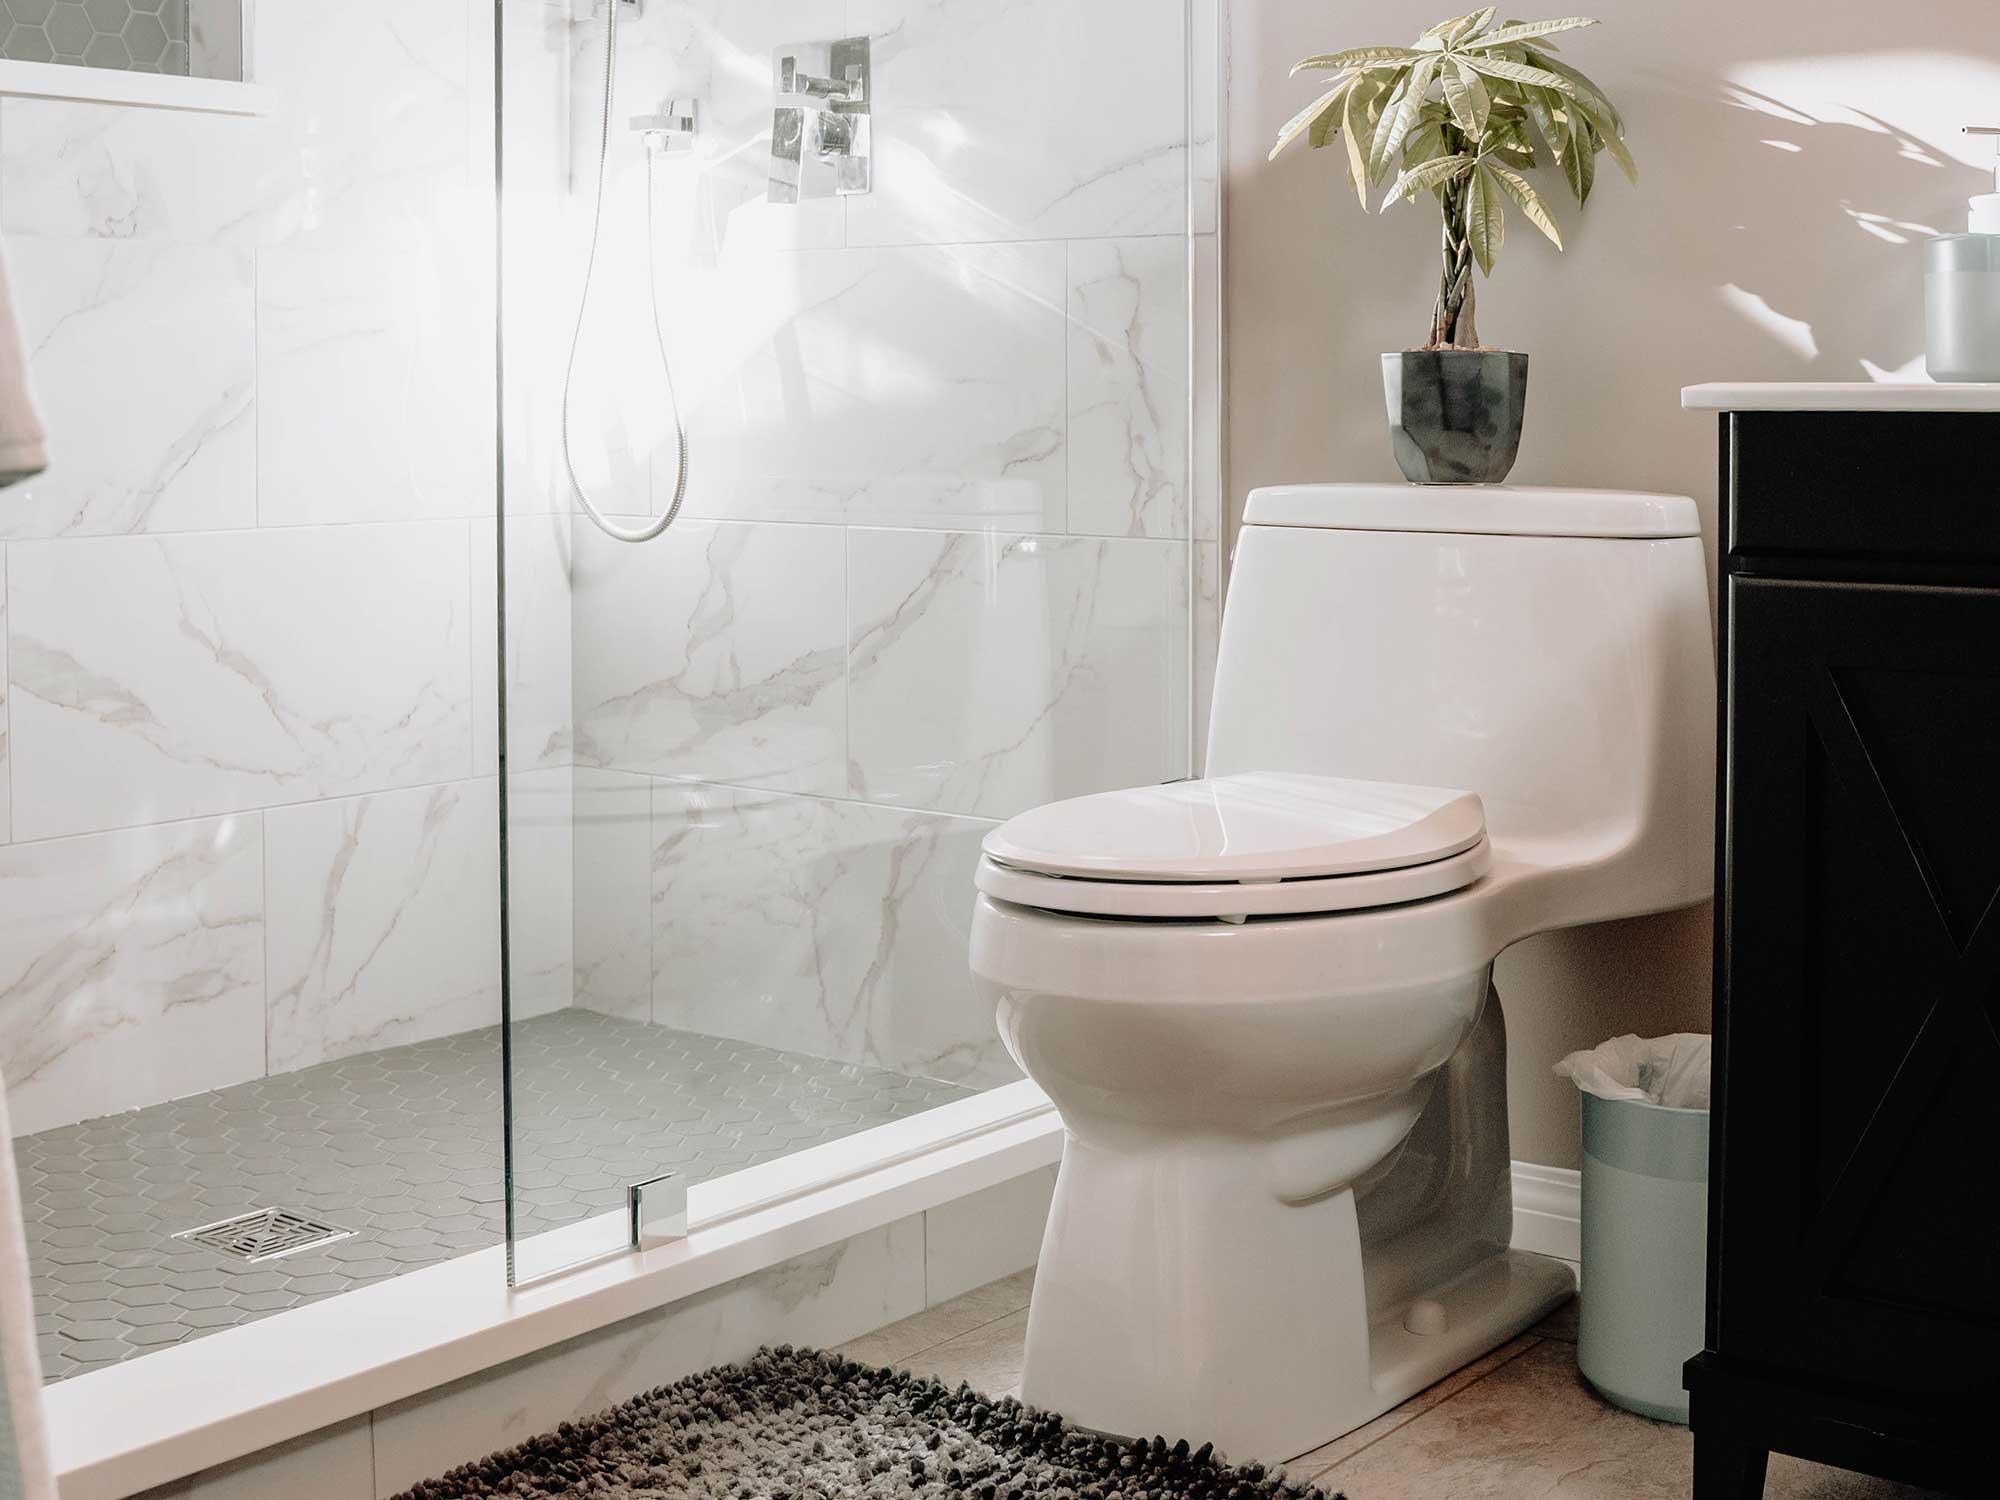 Toilet bowl in a nice bathroom